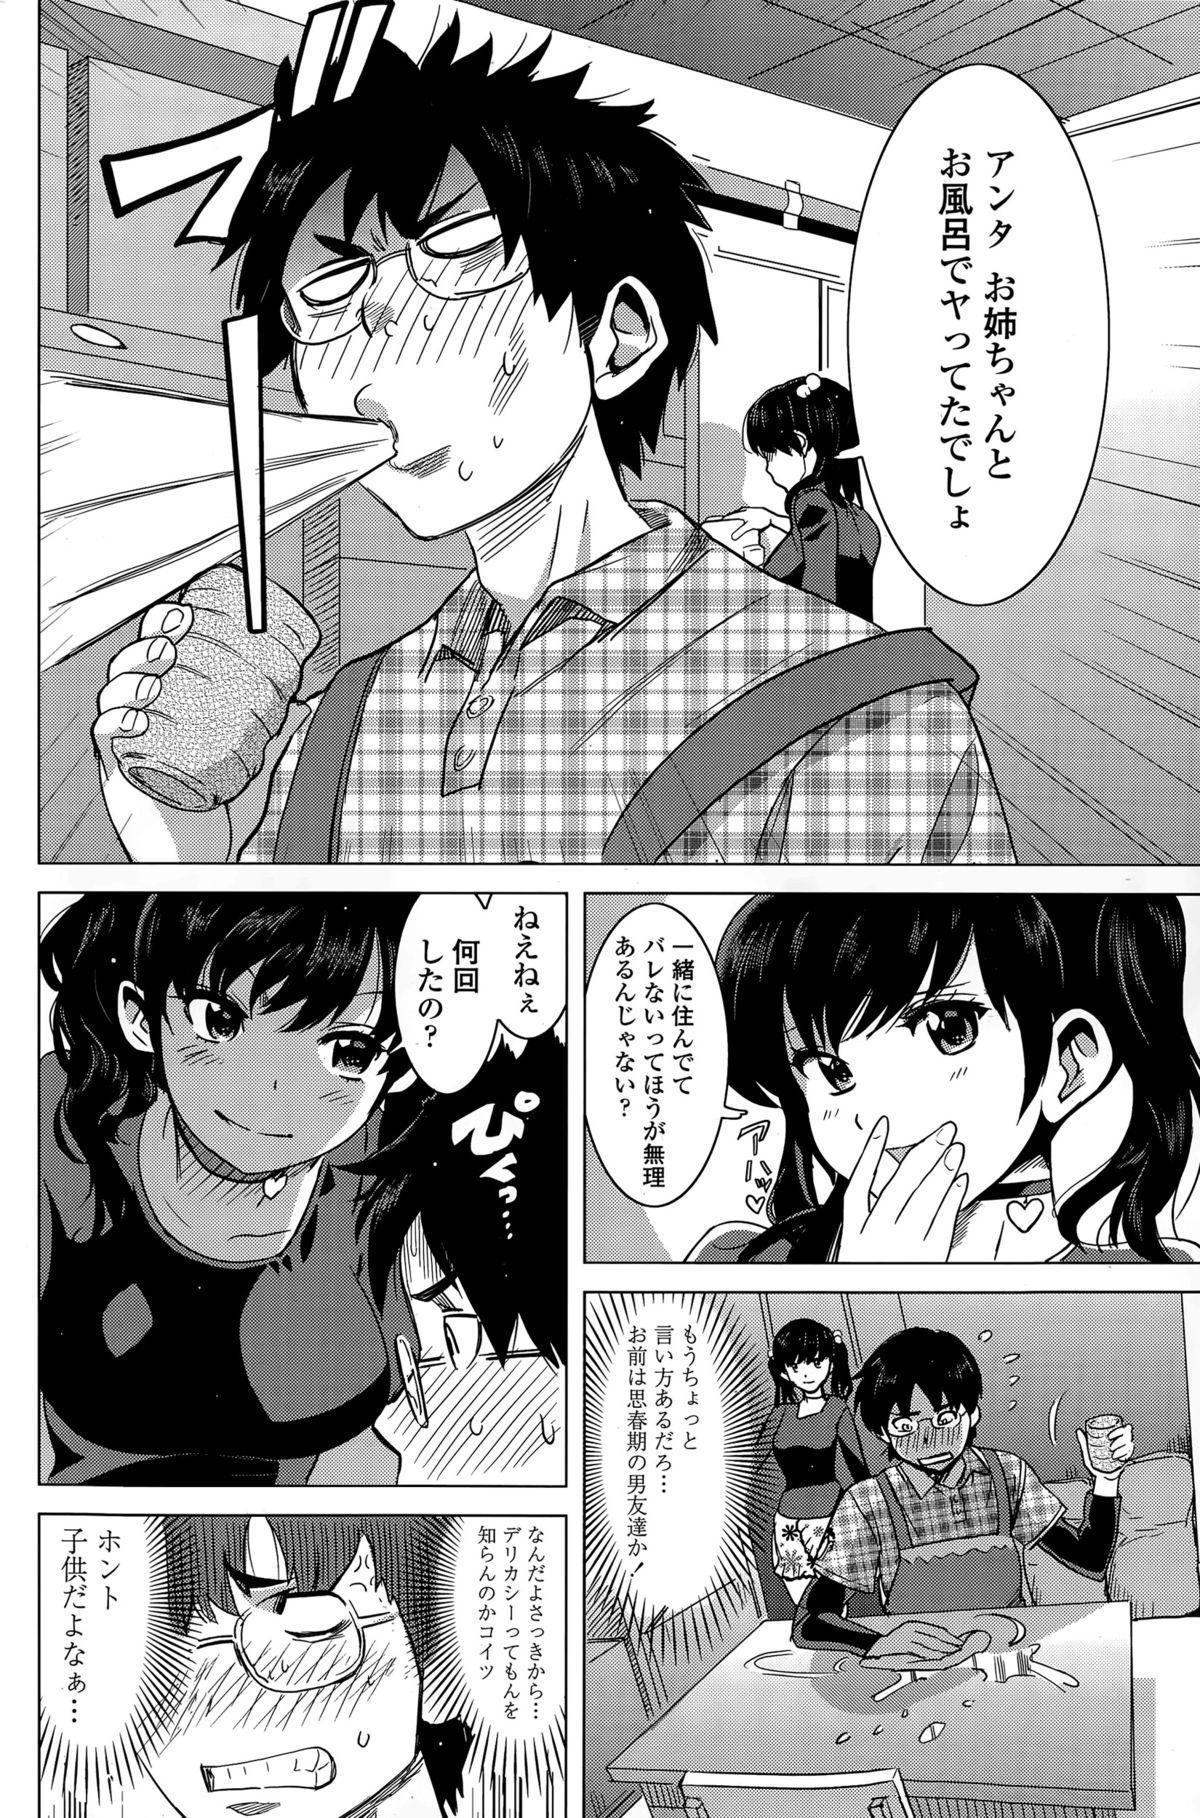 Milk Cafe Ch. 1-3 21